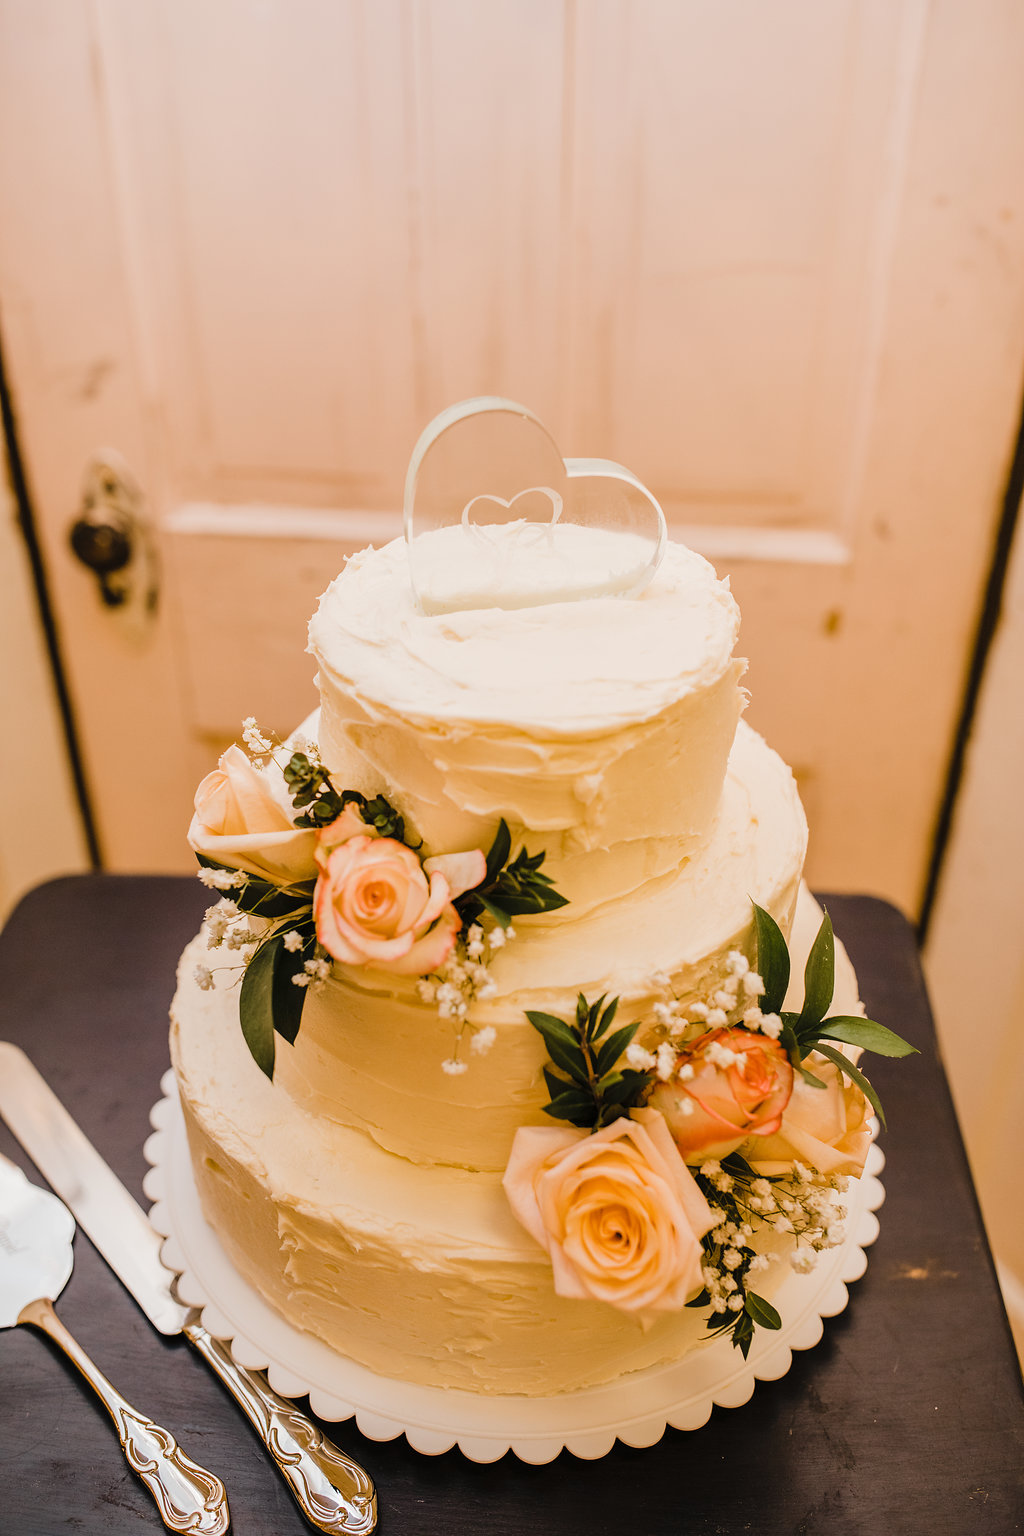 professional wedding photography reception cake lds church reception brigham city utah wedding photos calli richards